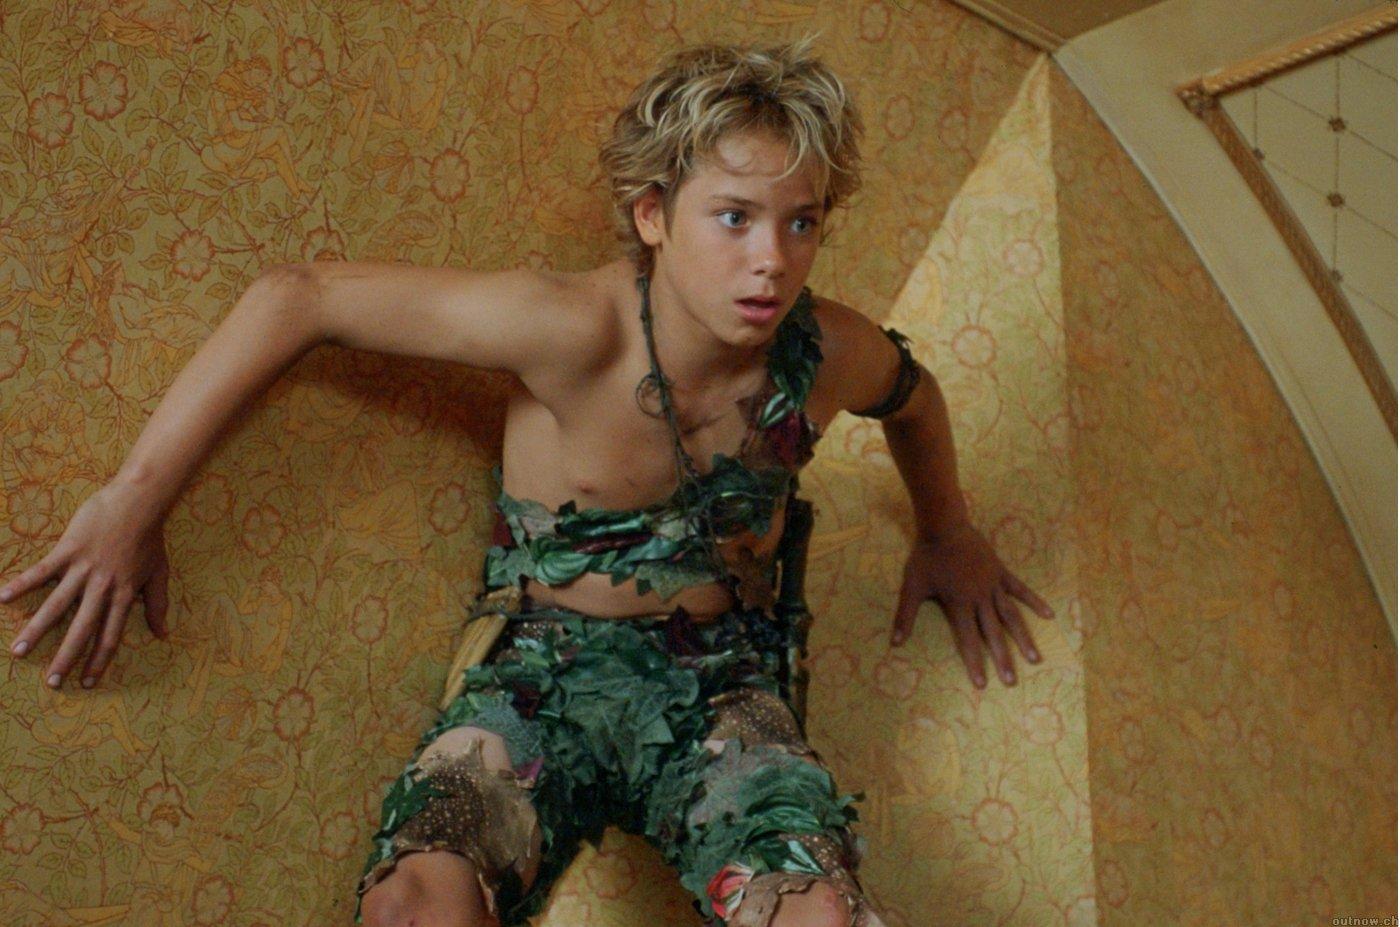 Peter Pan Jeremy Sumpter Naked Hot Girls Wallpaper